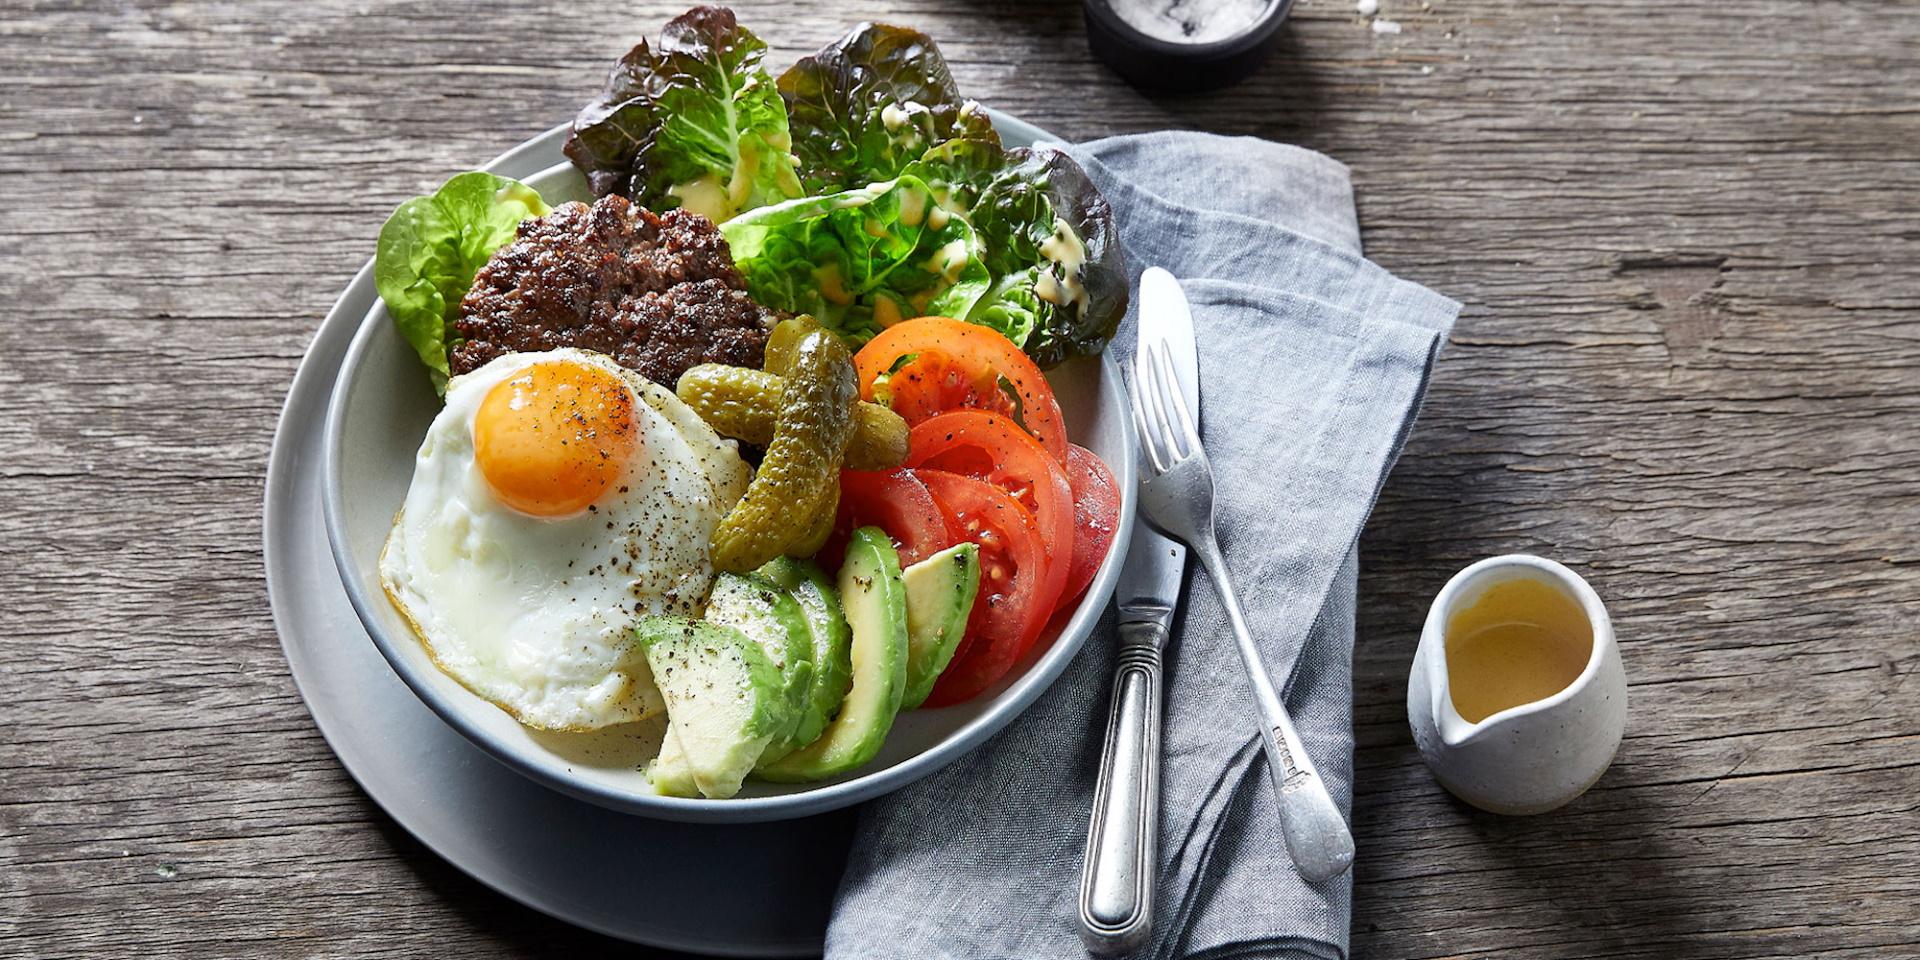 Pan-Seared Fish & Radish Salad with Slow-Fried